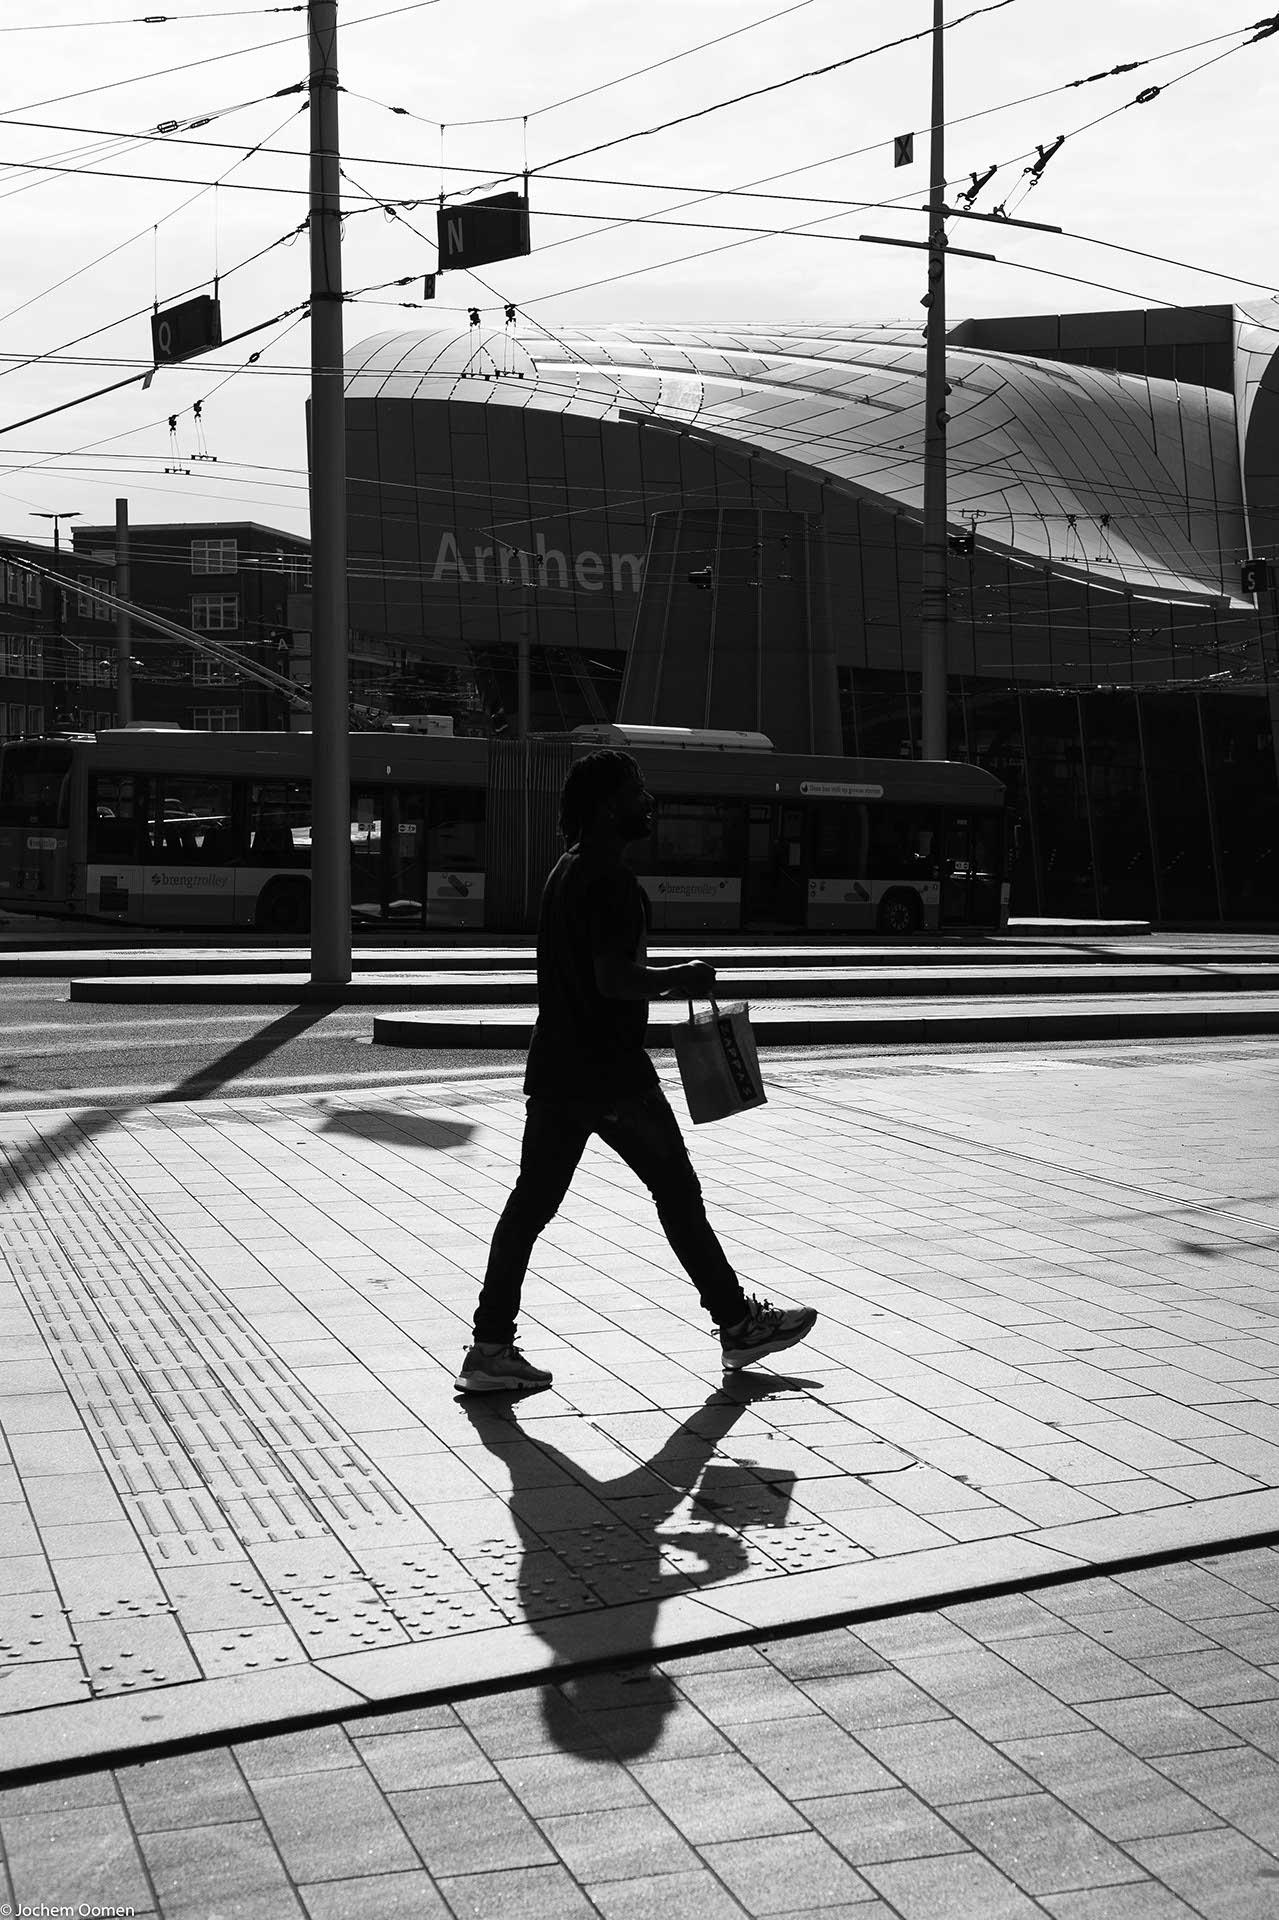 Street photography The Netherlands (photo: Jochem Oomen)